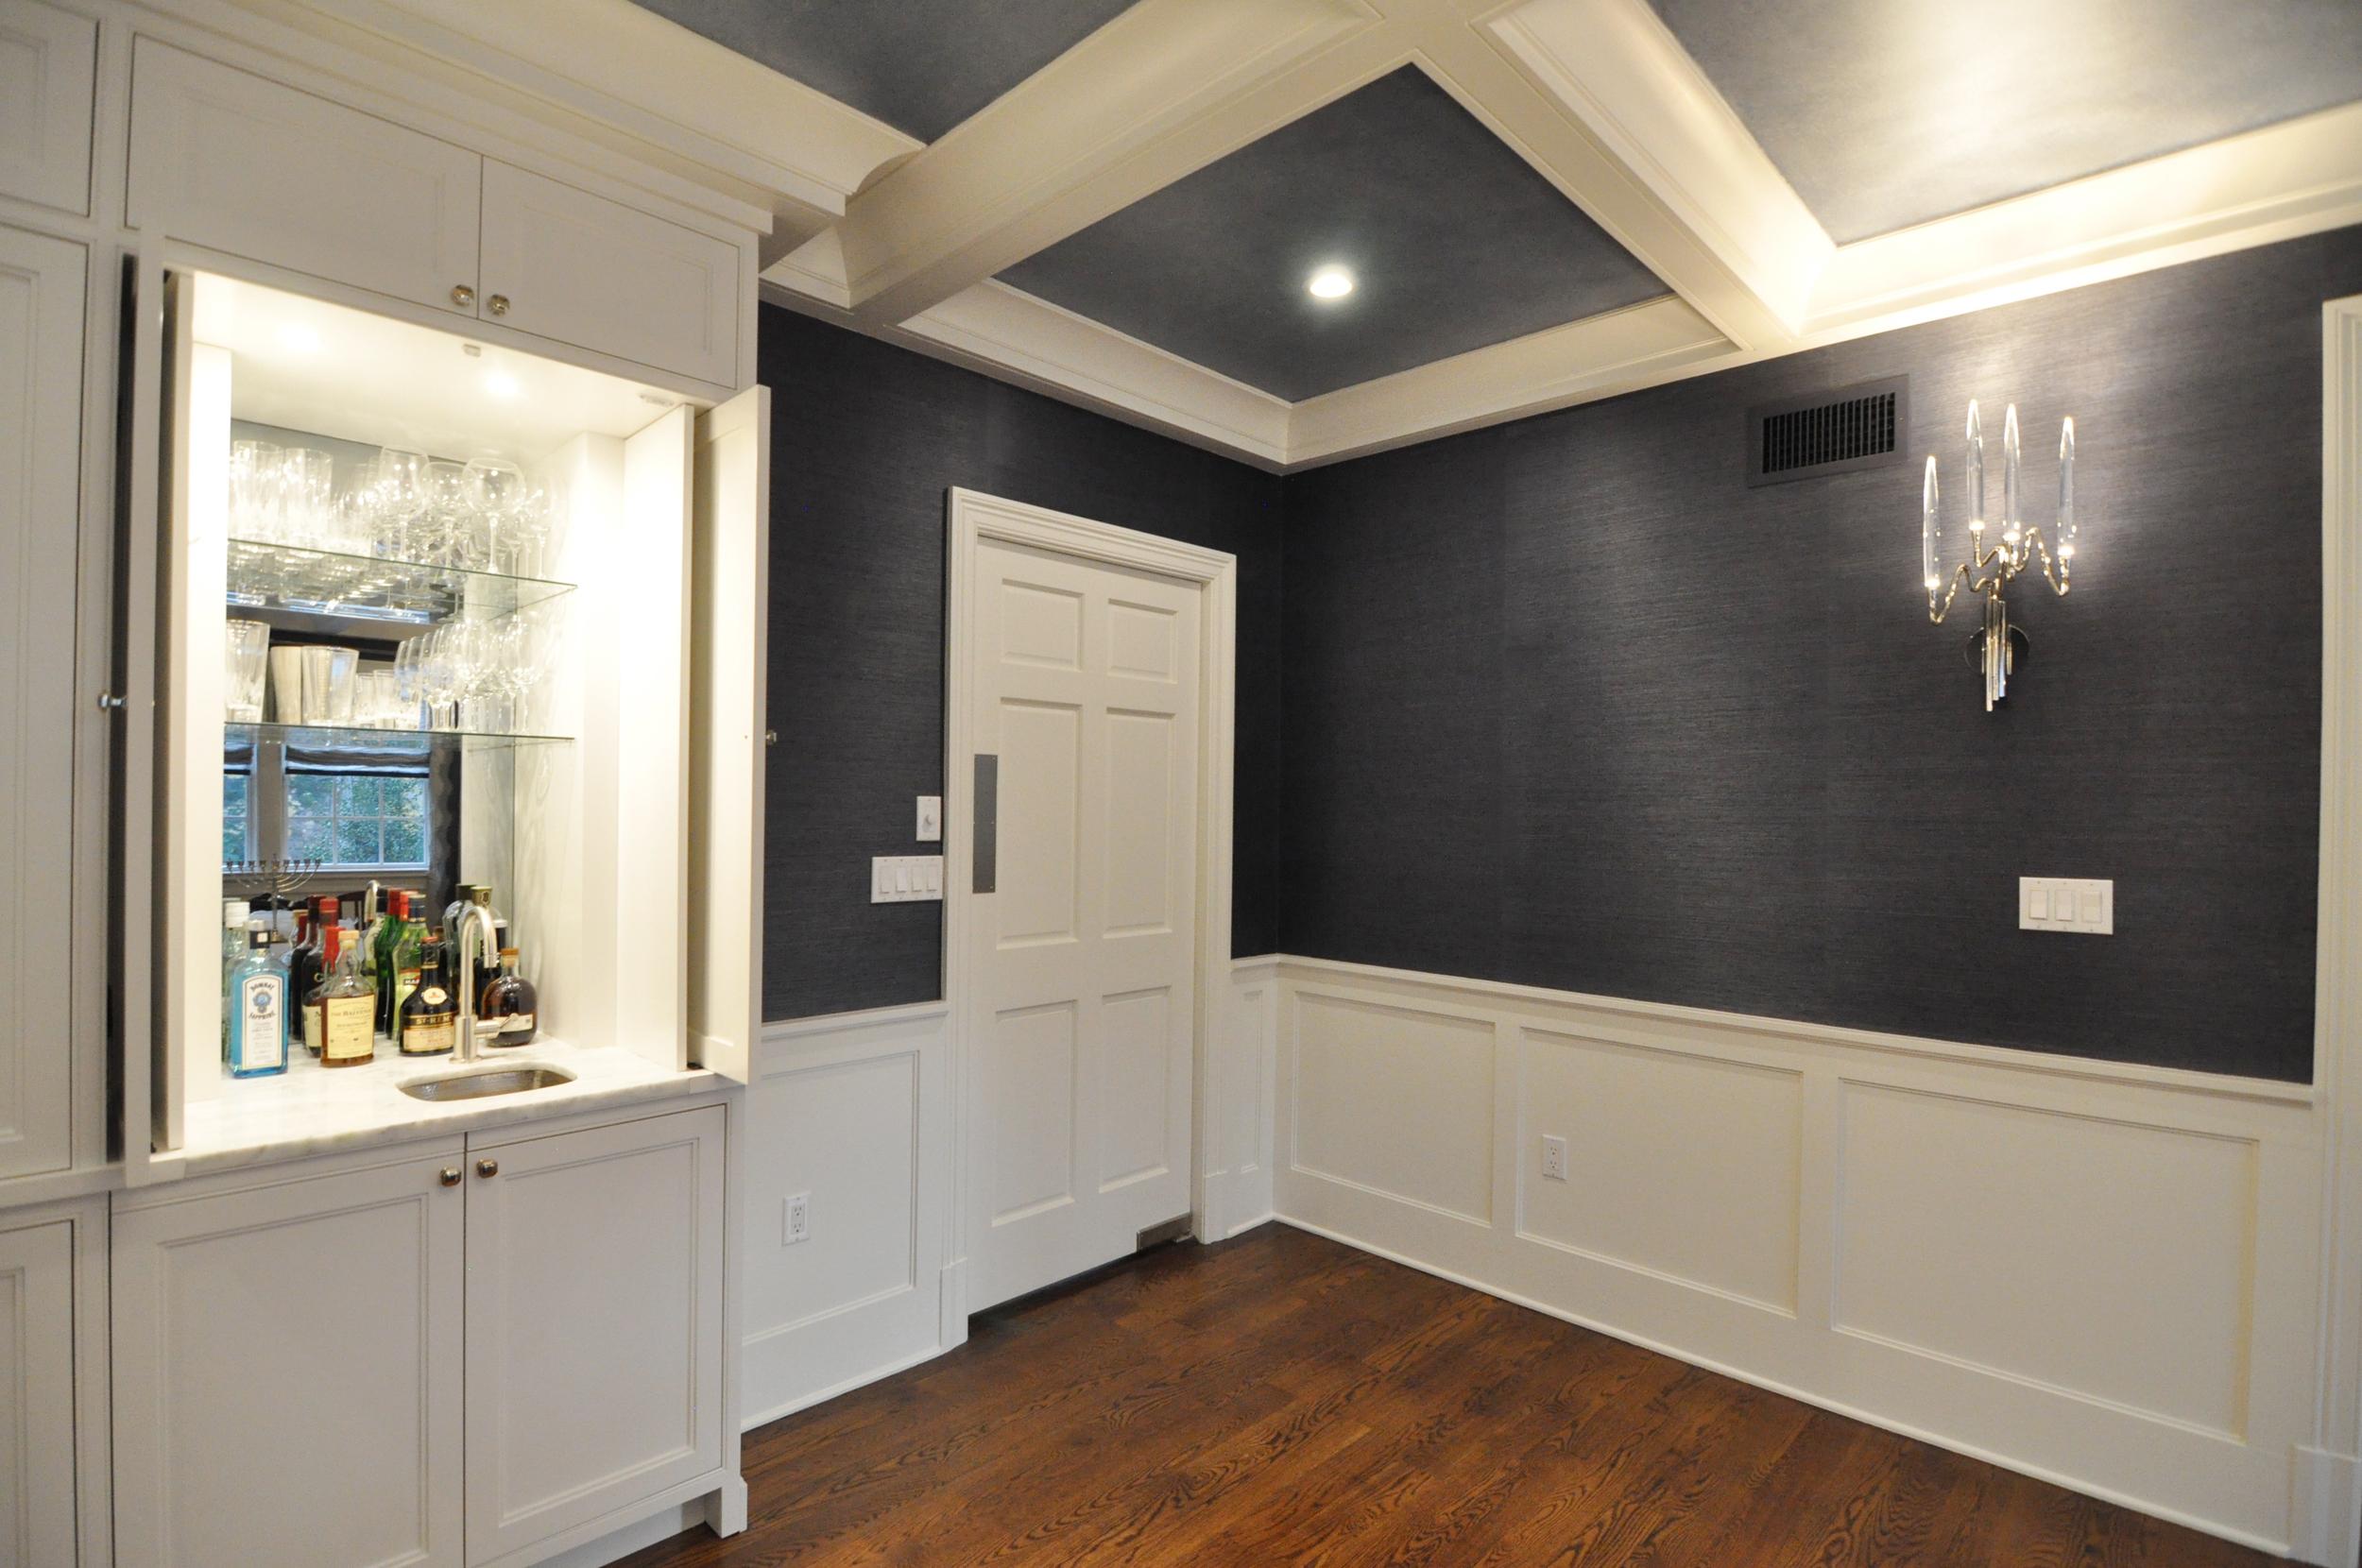 KAM DESIGN_Dining Room Millwork_Wet Bar_Wainscotting_Coffered Ceiling - 1.jpg